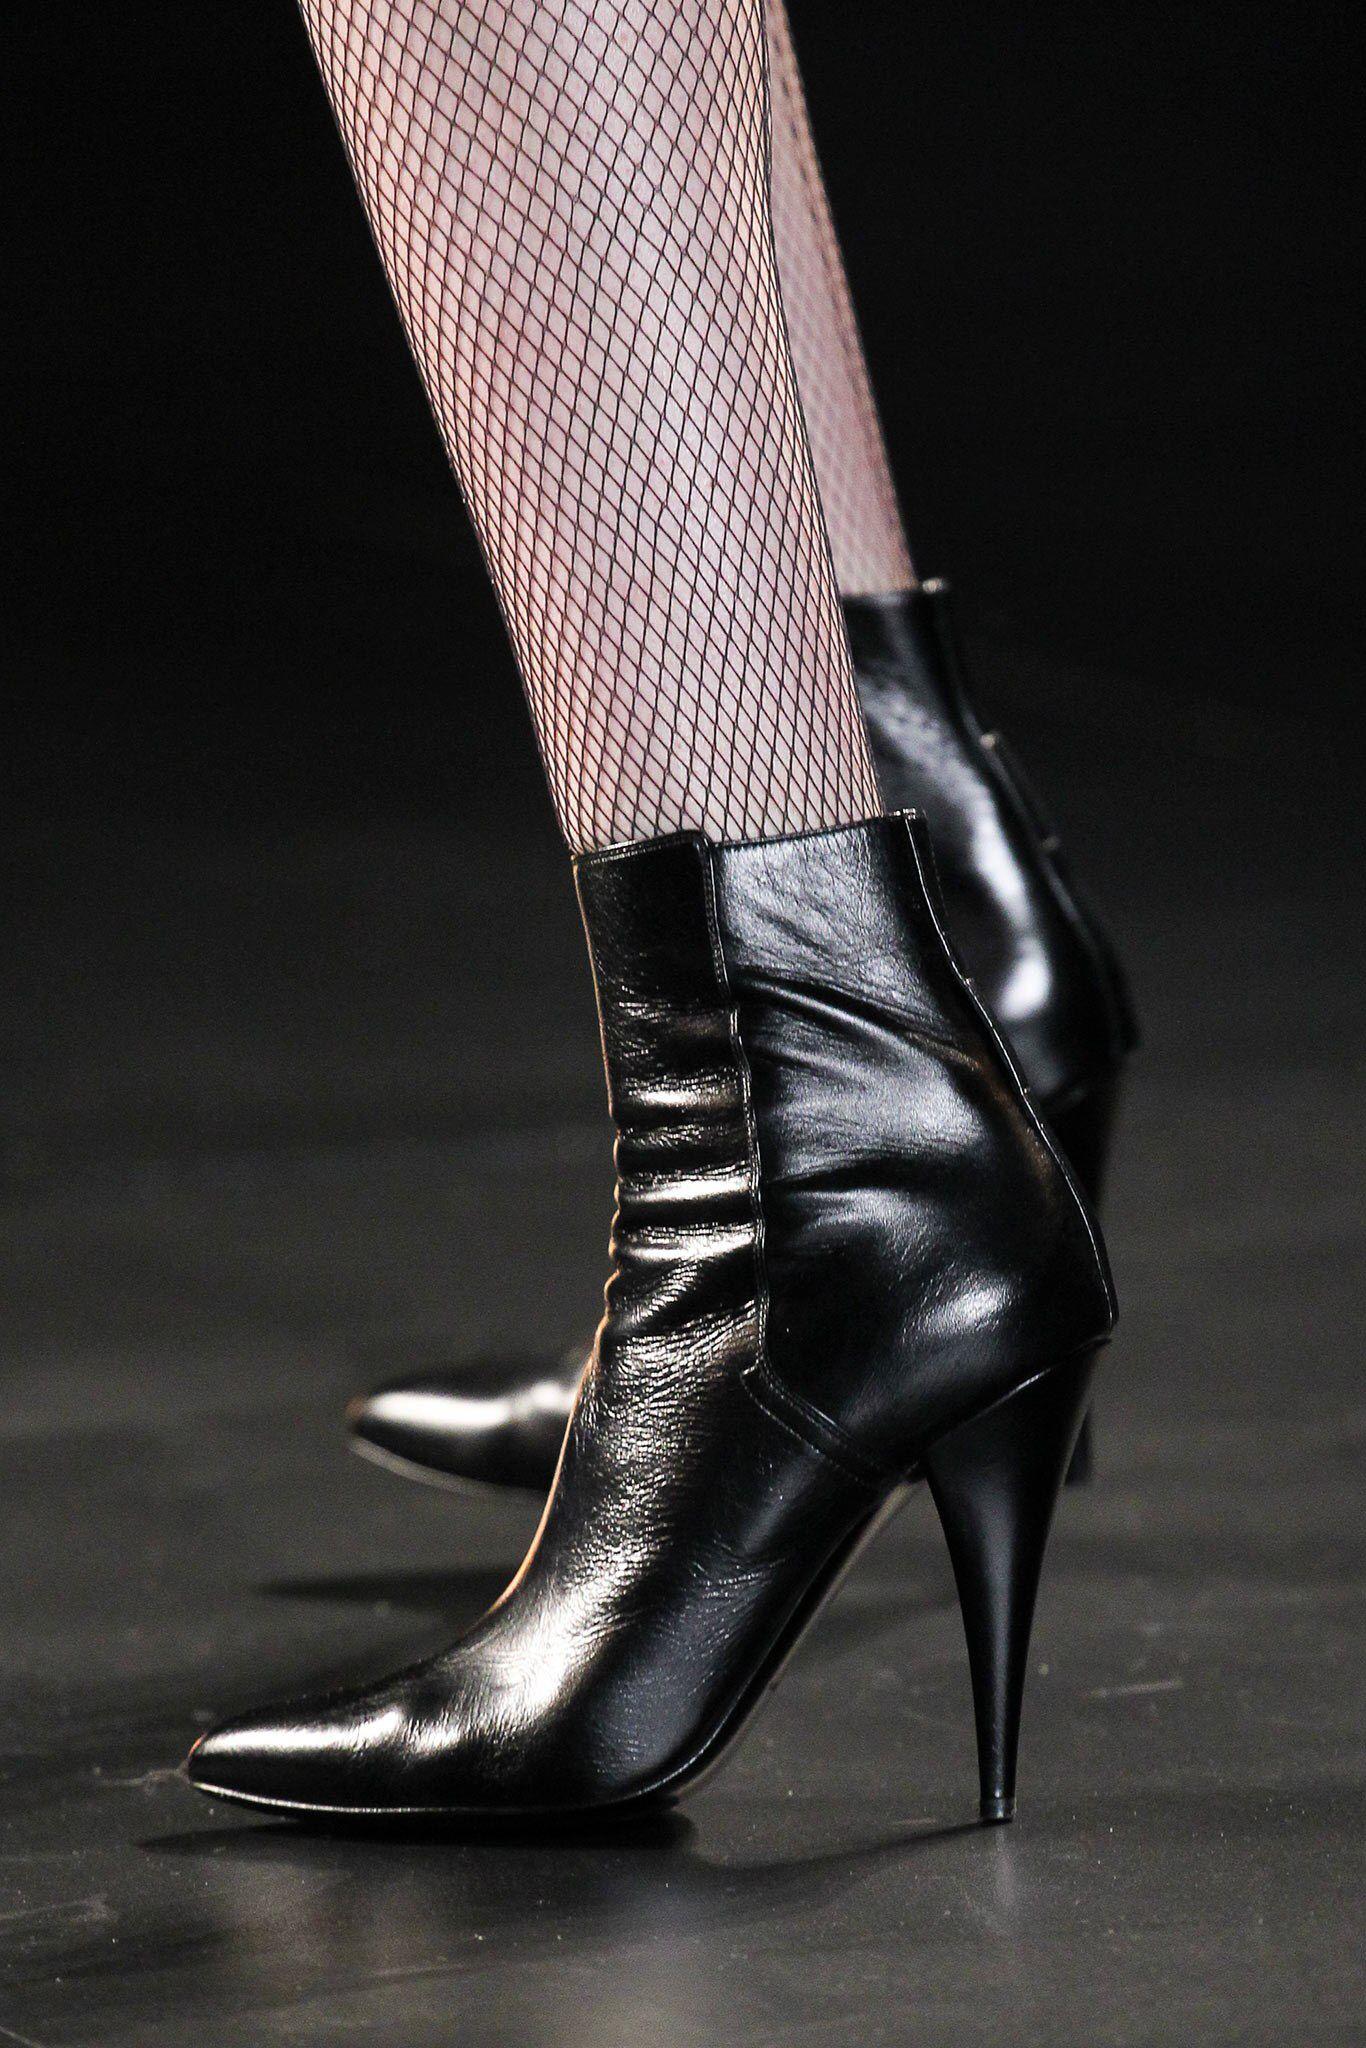 Pin On Badass Boots